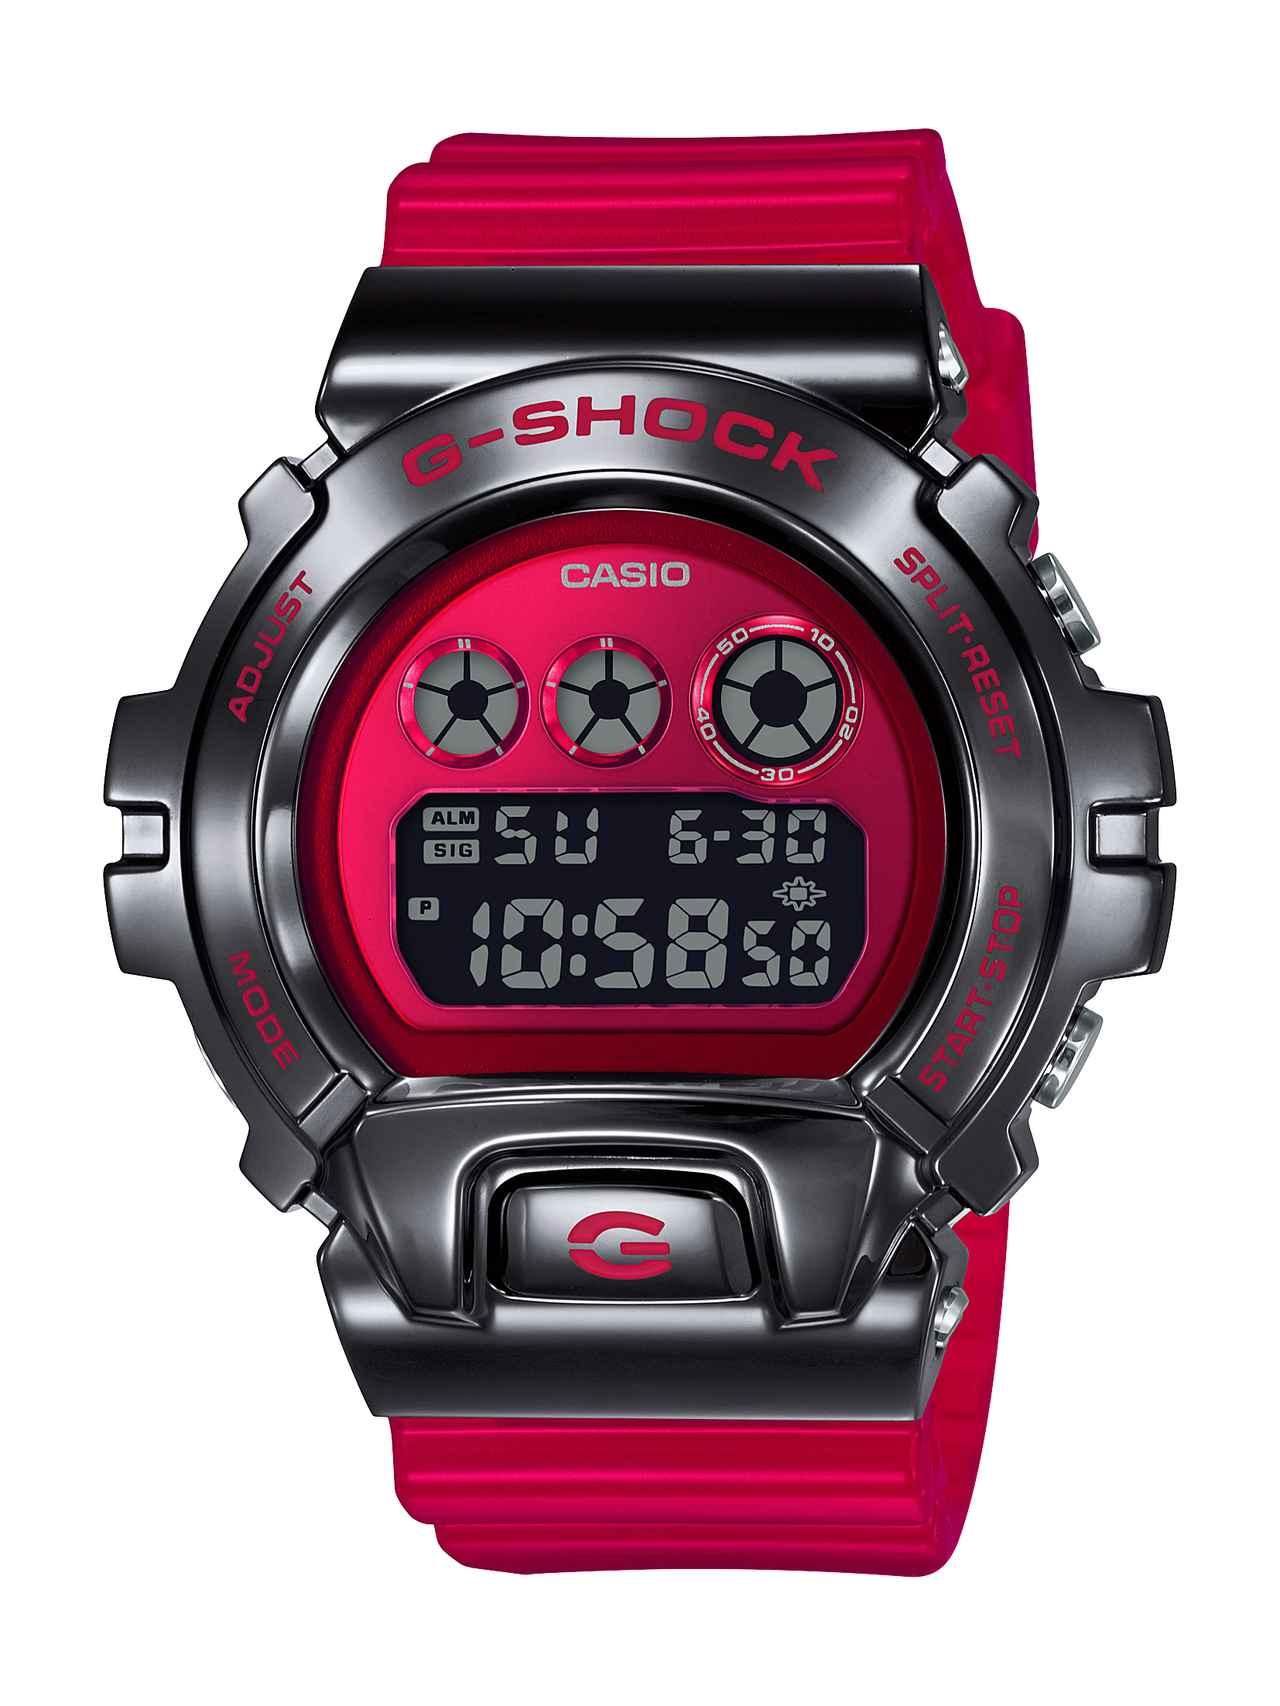 G-SHOCKの定番「三つ目」の6900シリーズに初のメタルベゼル採用モデルが登場!